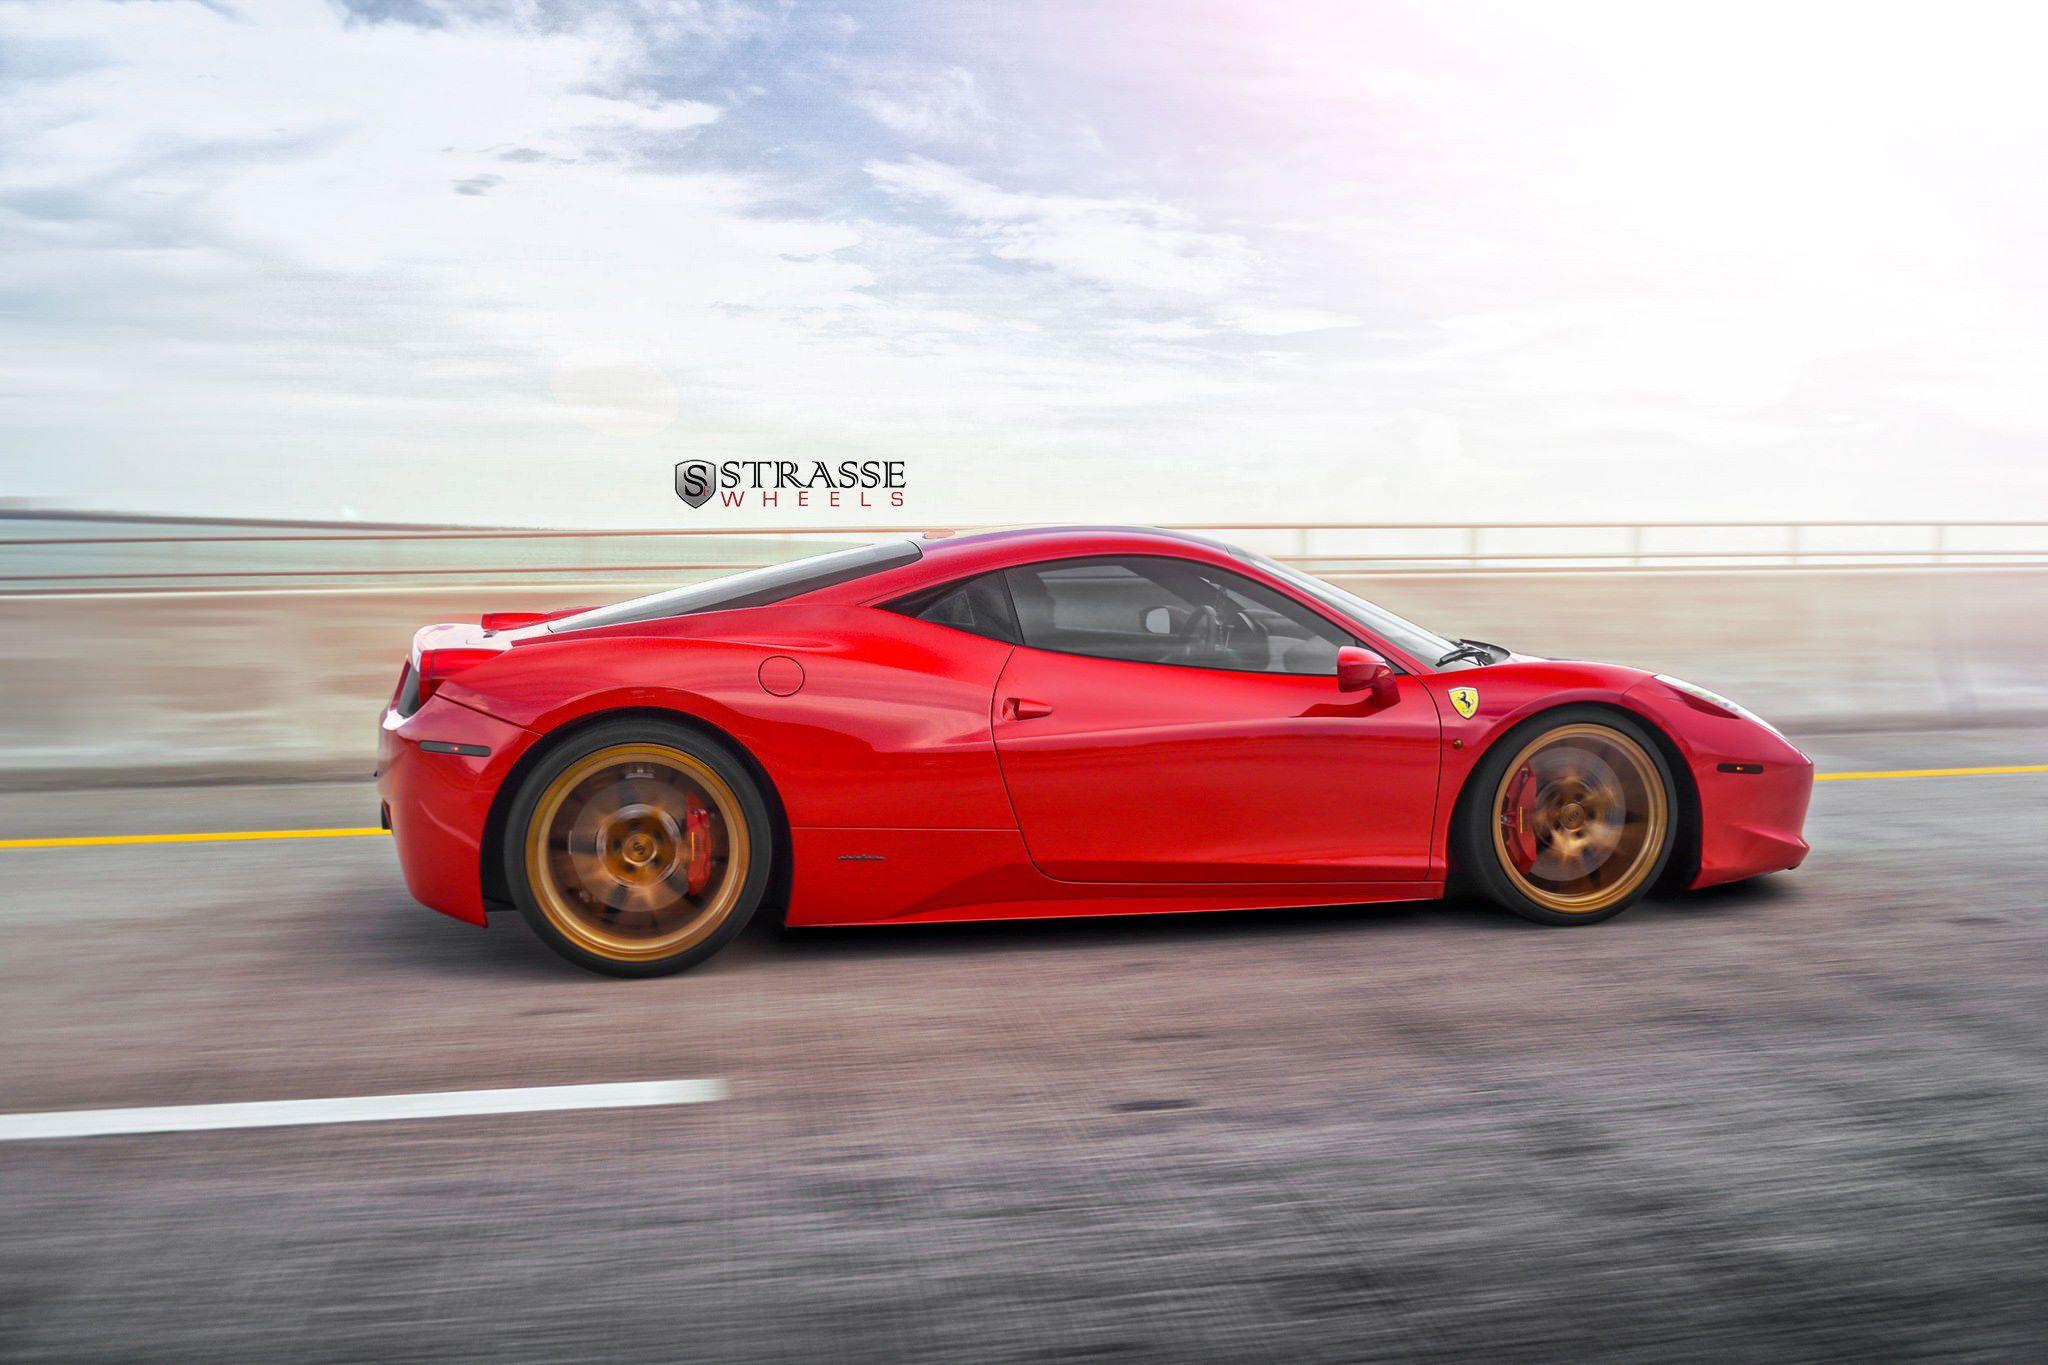 red ferrari 458 italia on bronze strasse wheels side angle in motion image gallery - Wheelsandmore Ferrari 458 Italia